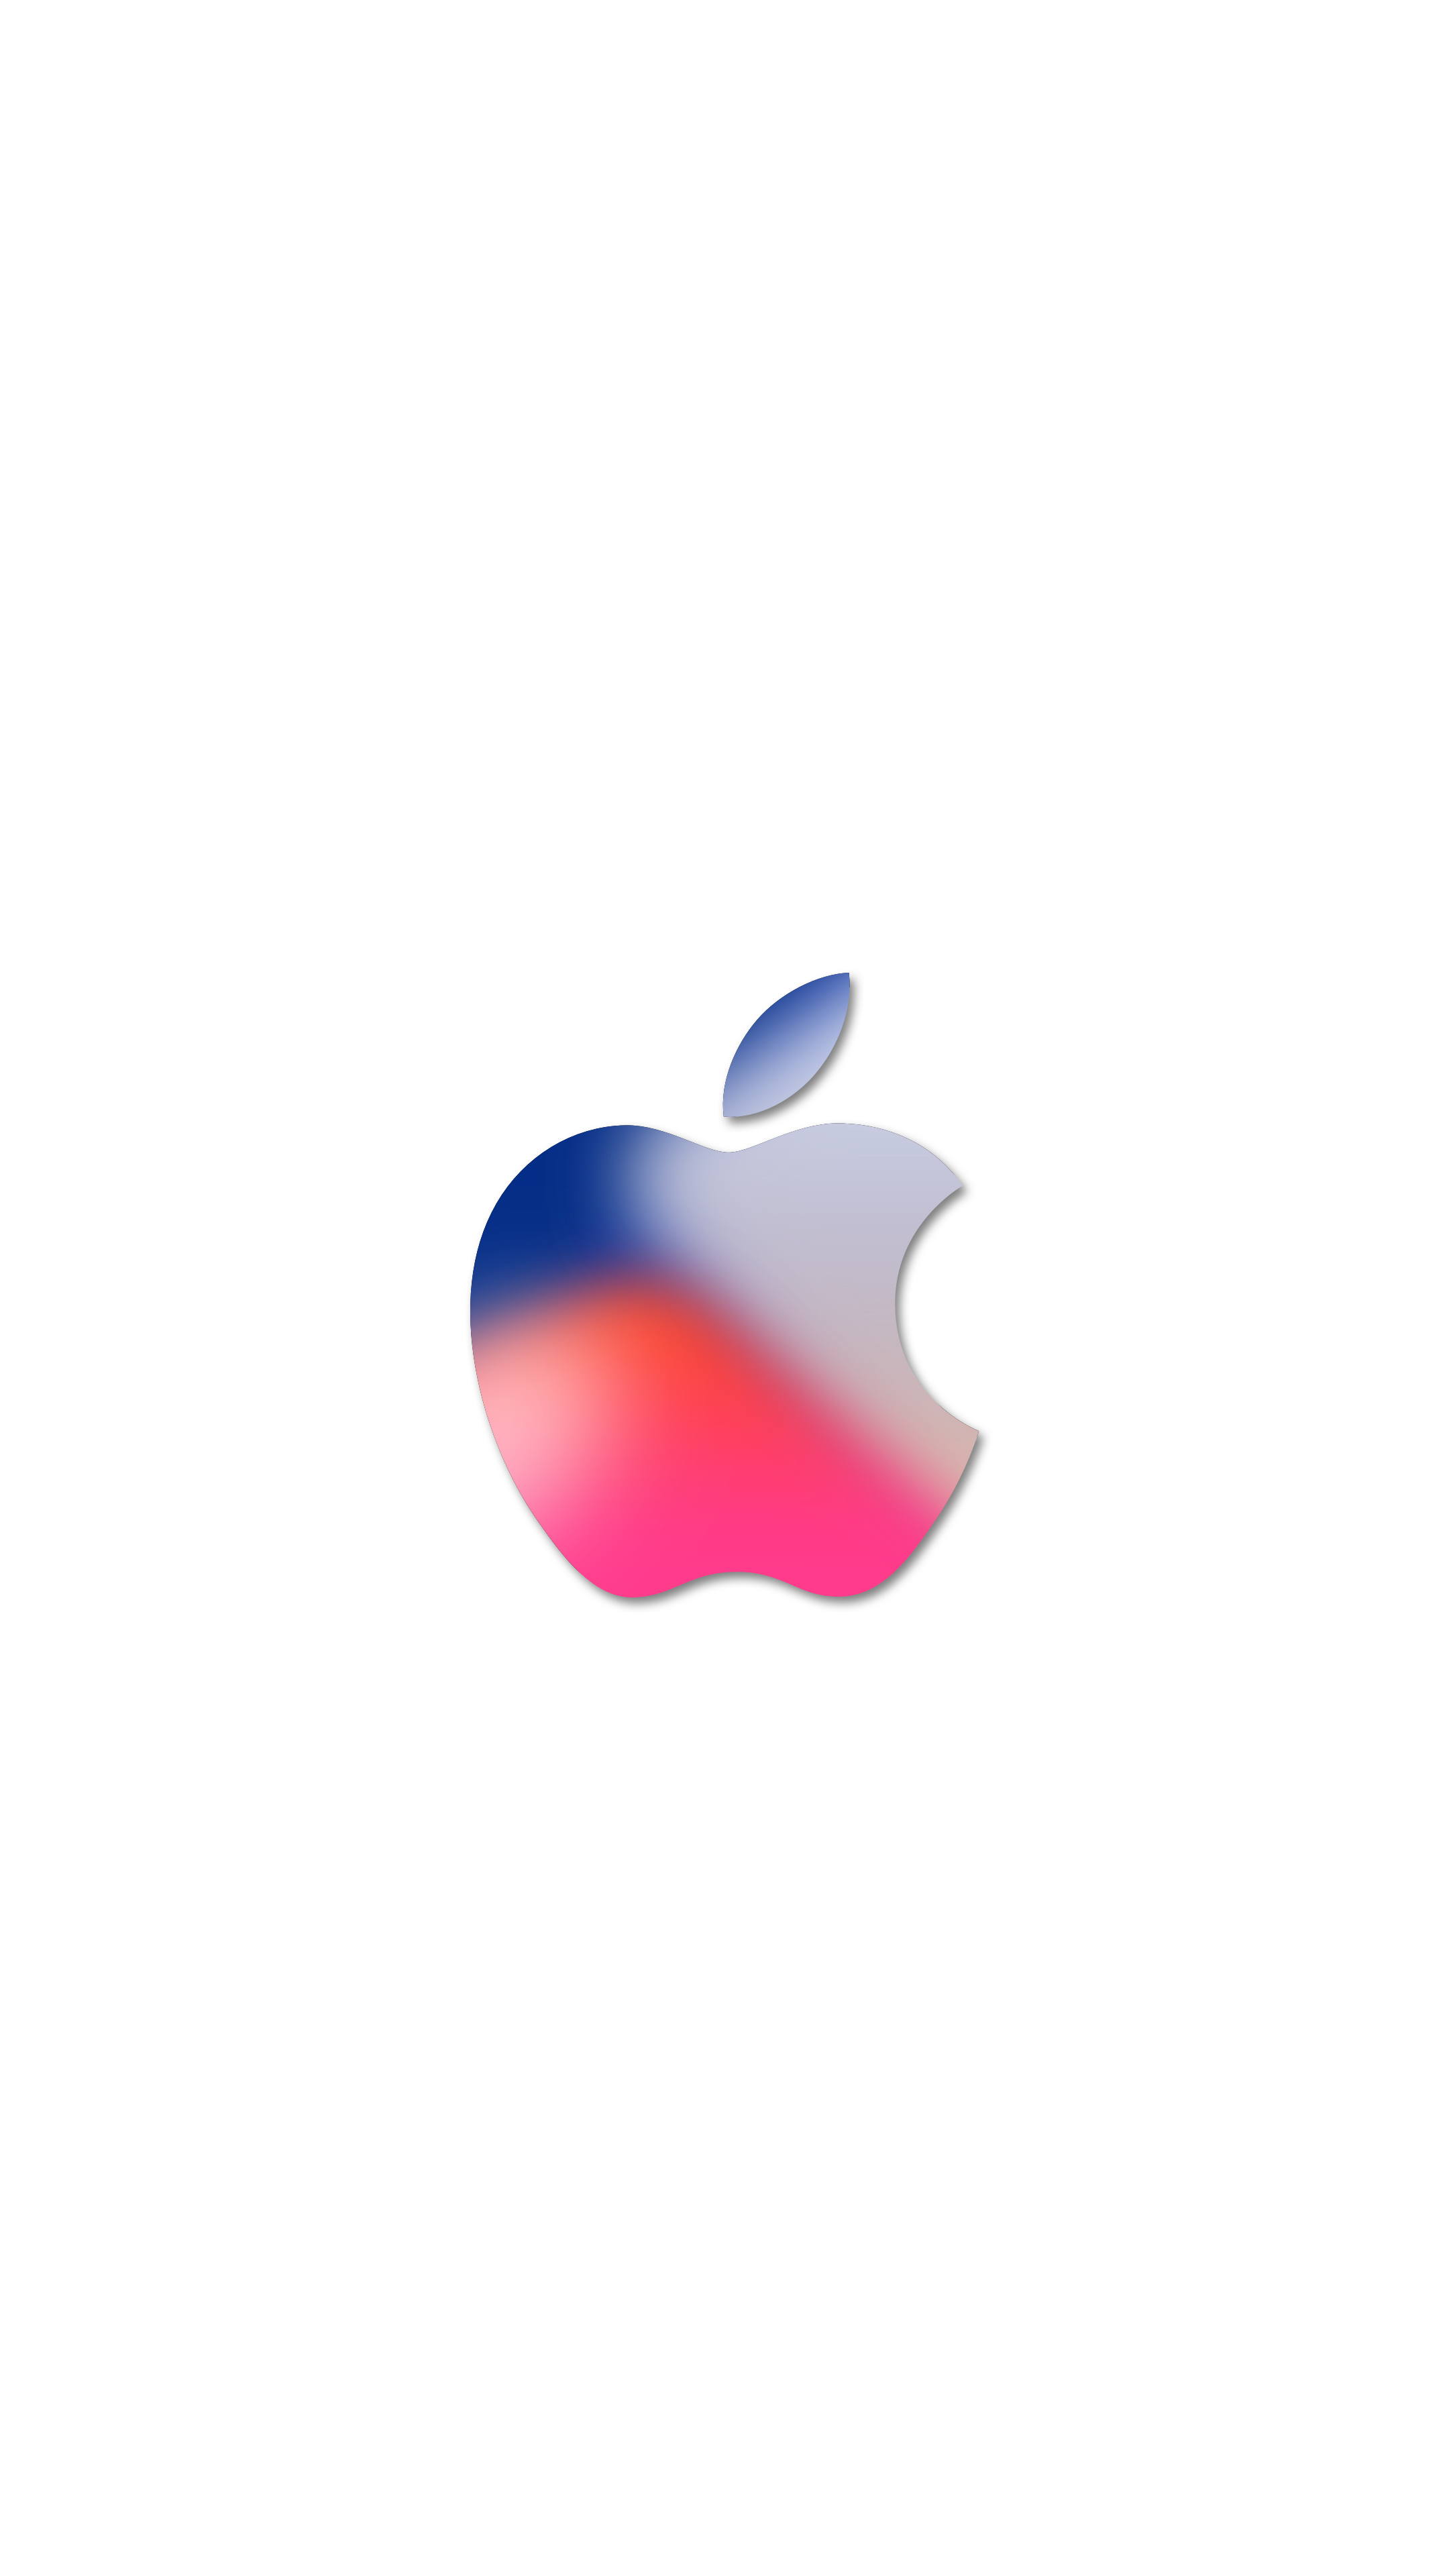 Rainbow Apple Logo Iphone Wallpapers Top Free Rainbow